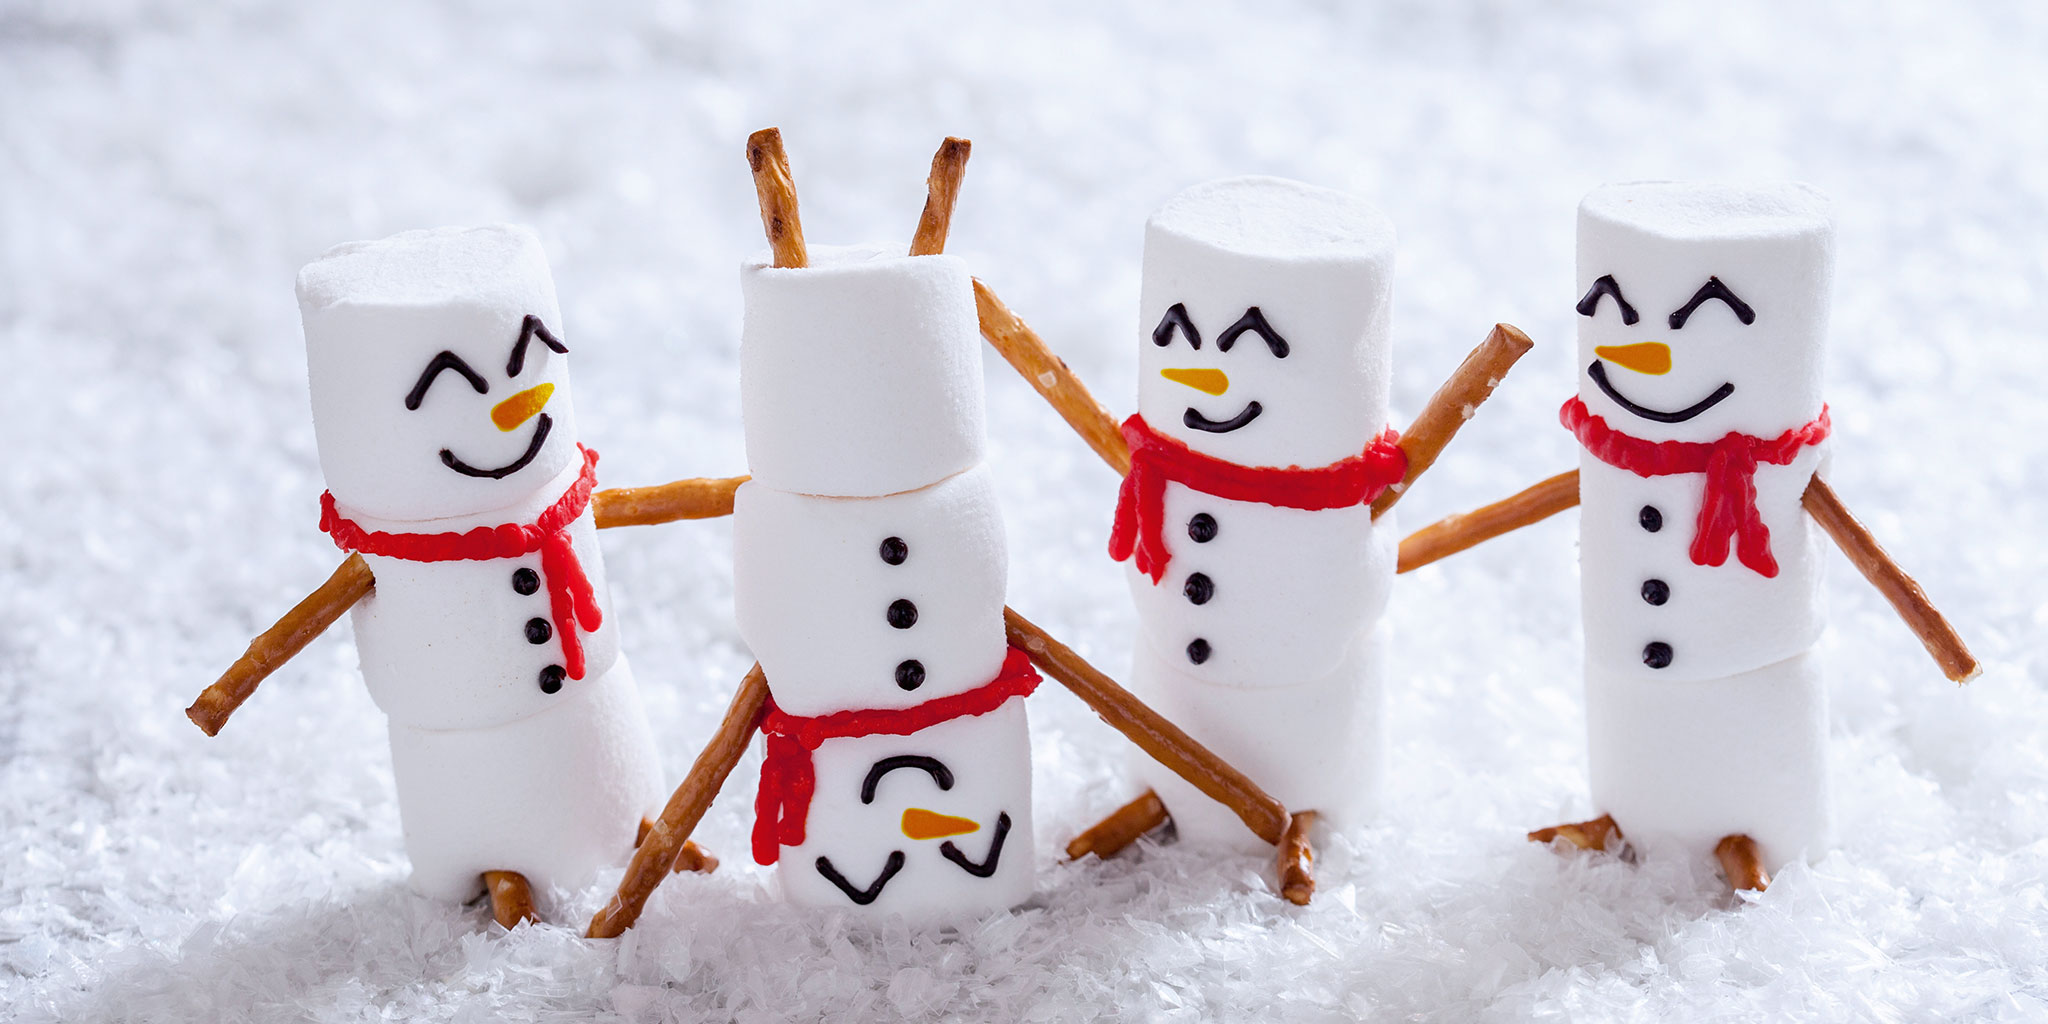 Faux bonhommes de neige